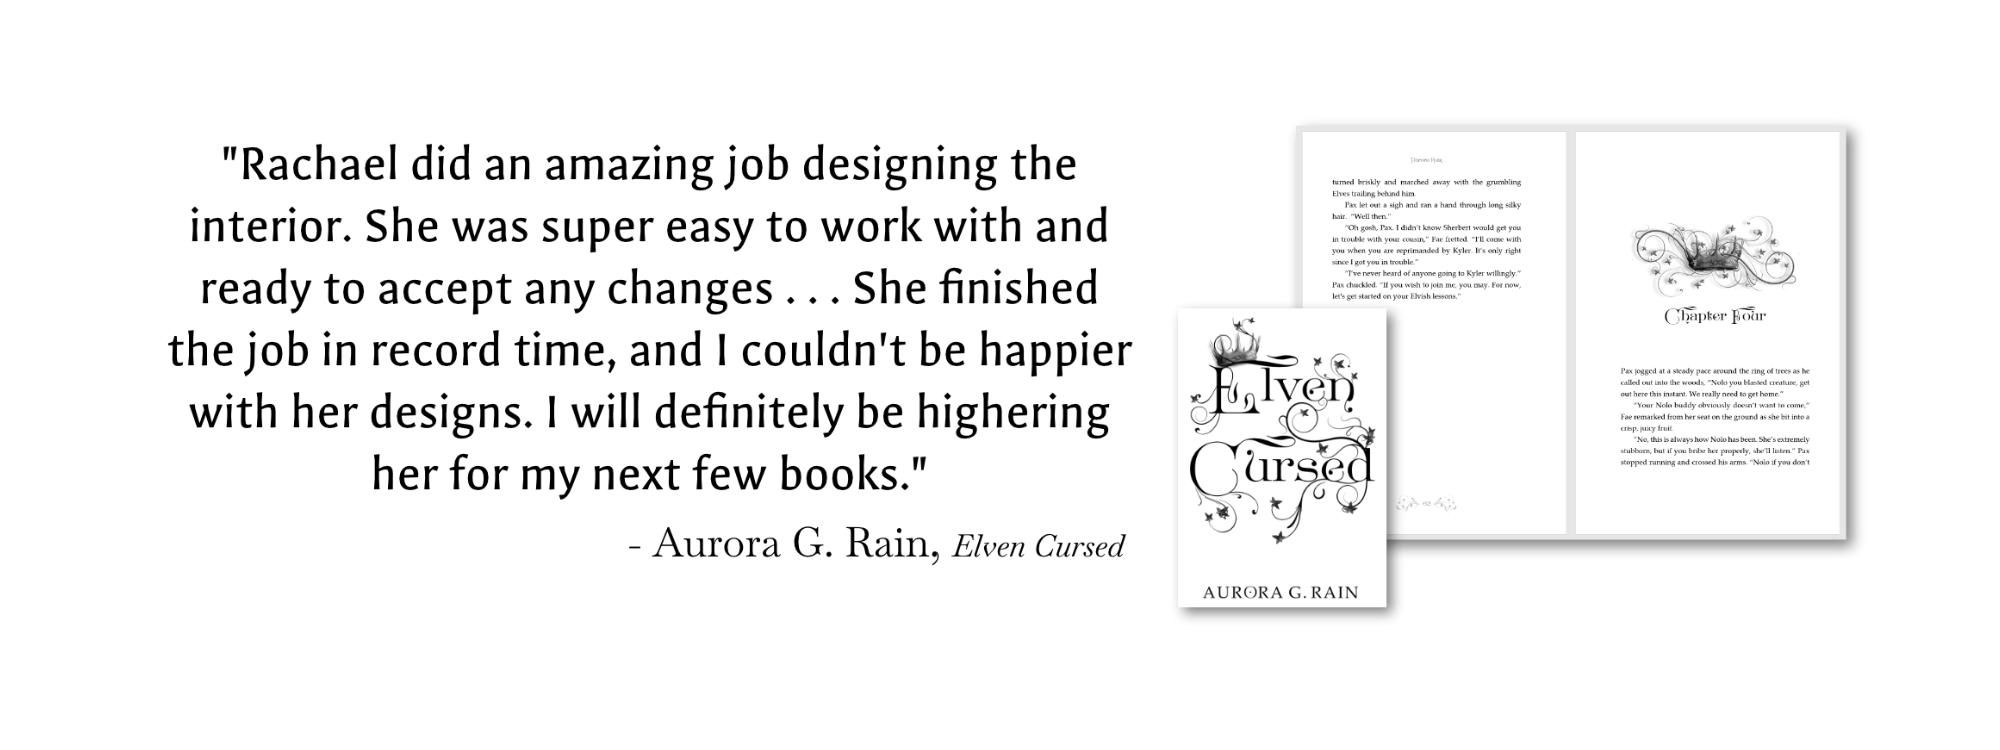 Book design Recommendation from Aurora G. Rain